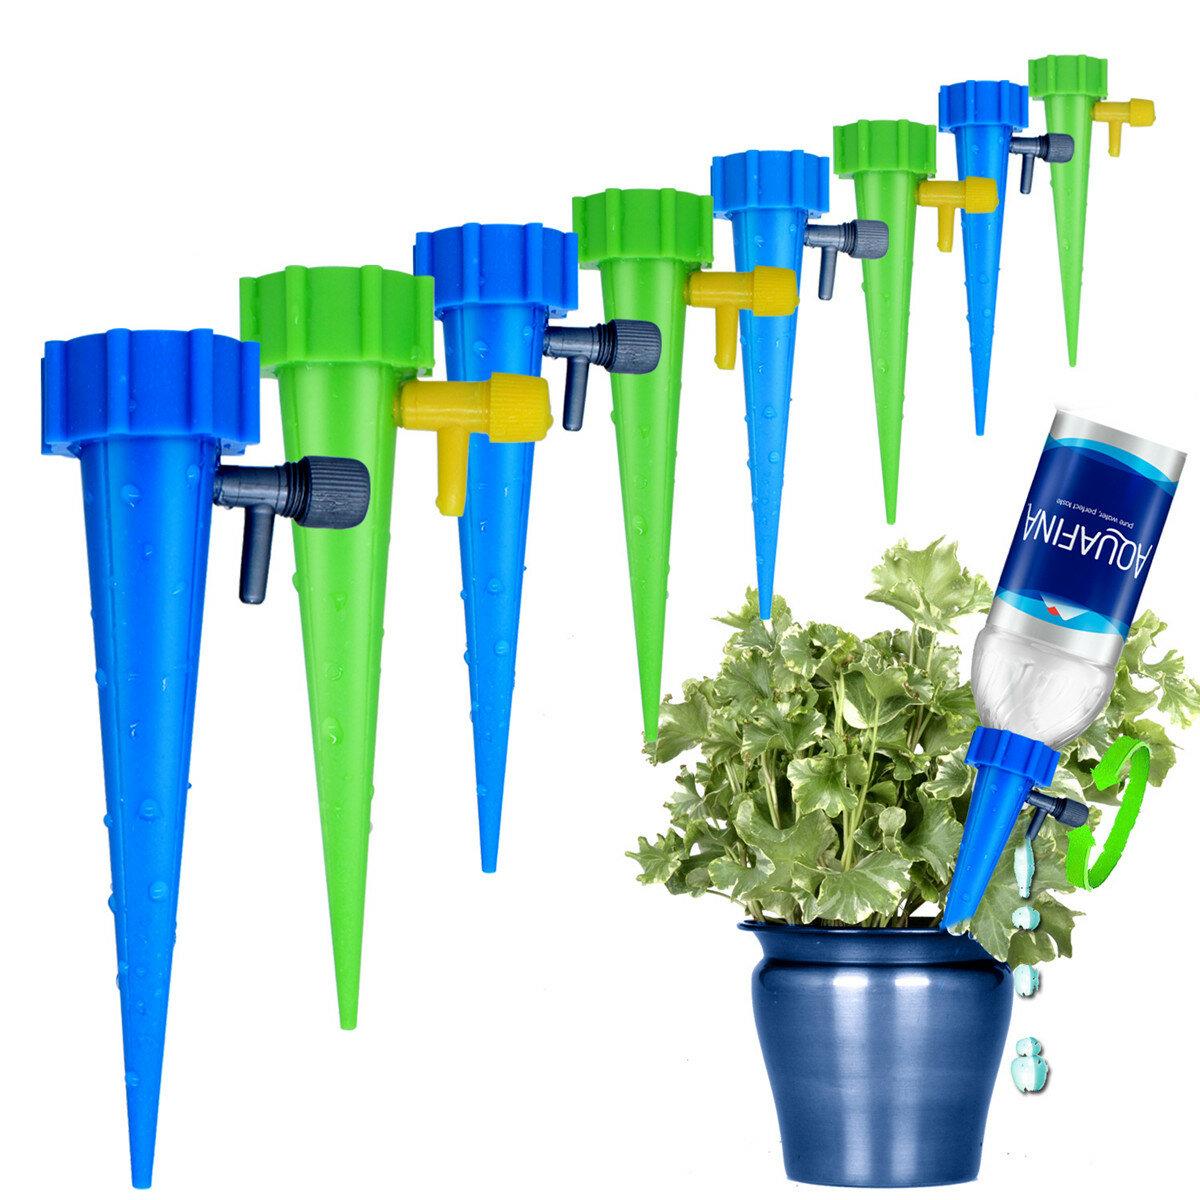 watering device adjustable water flow